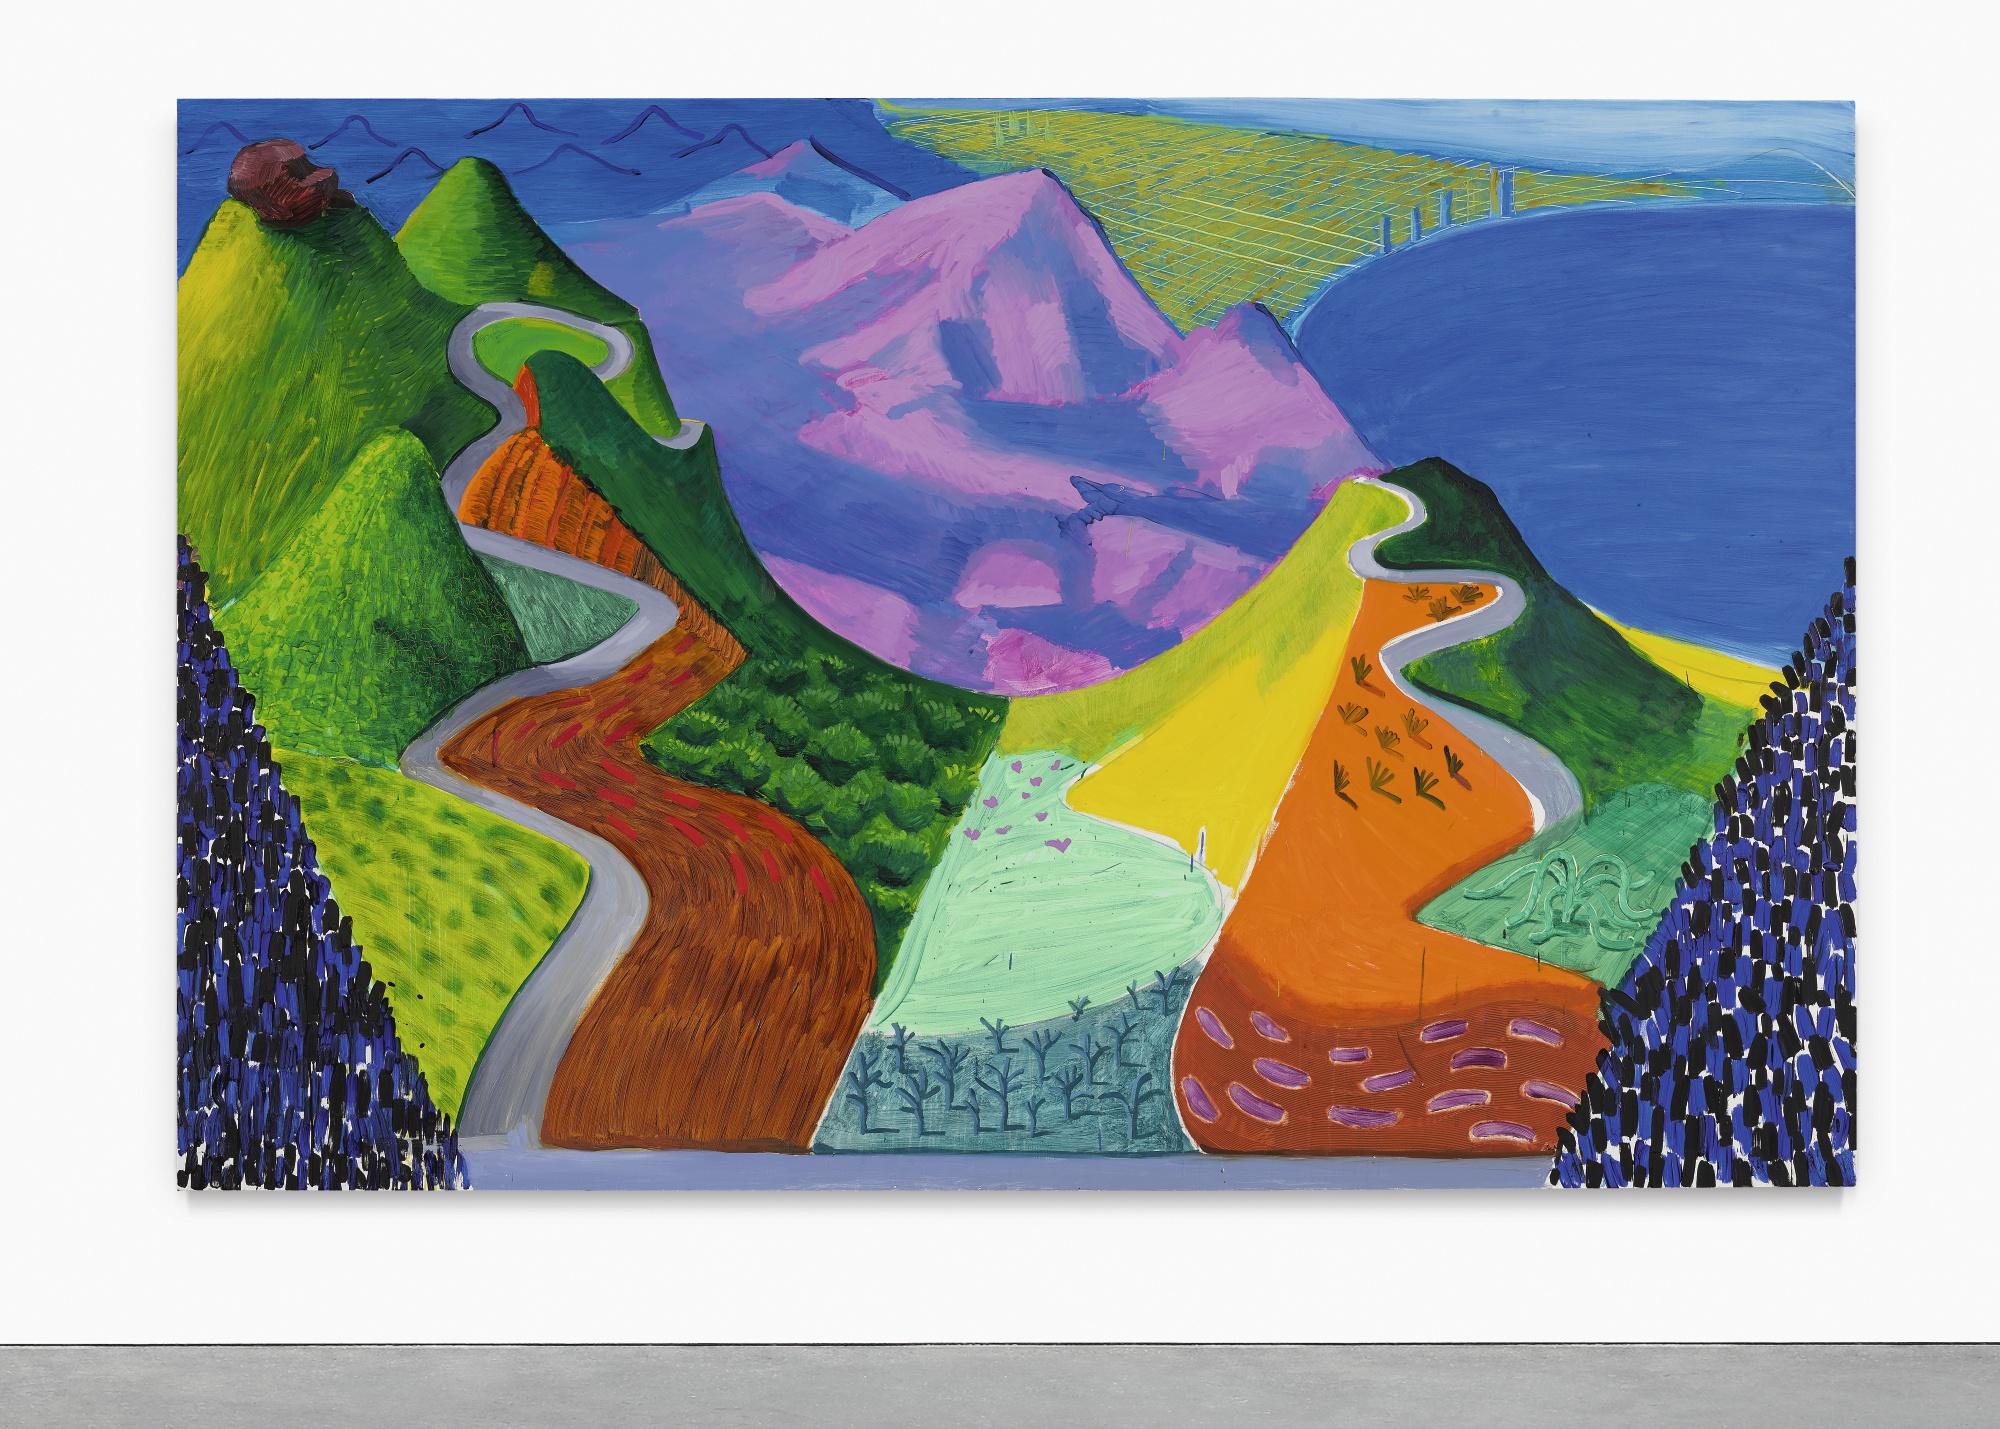 David Hockney, Pacific Coast Highway and Santa Monica, 1990 | Abb.: ©Sotheby's